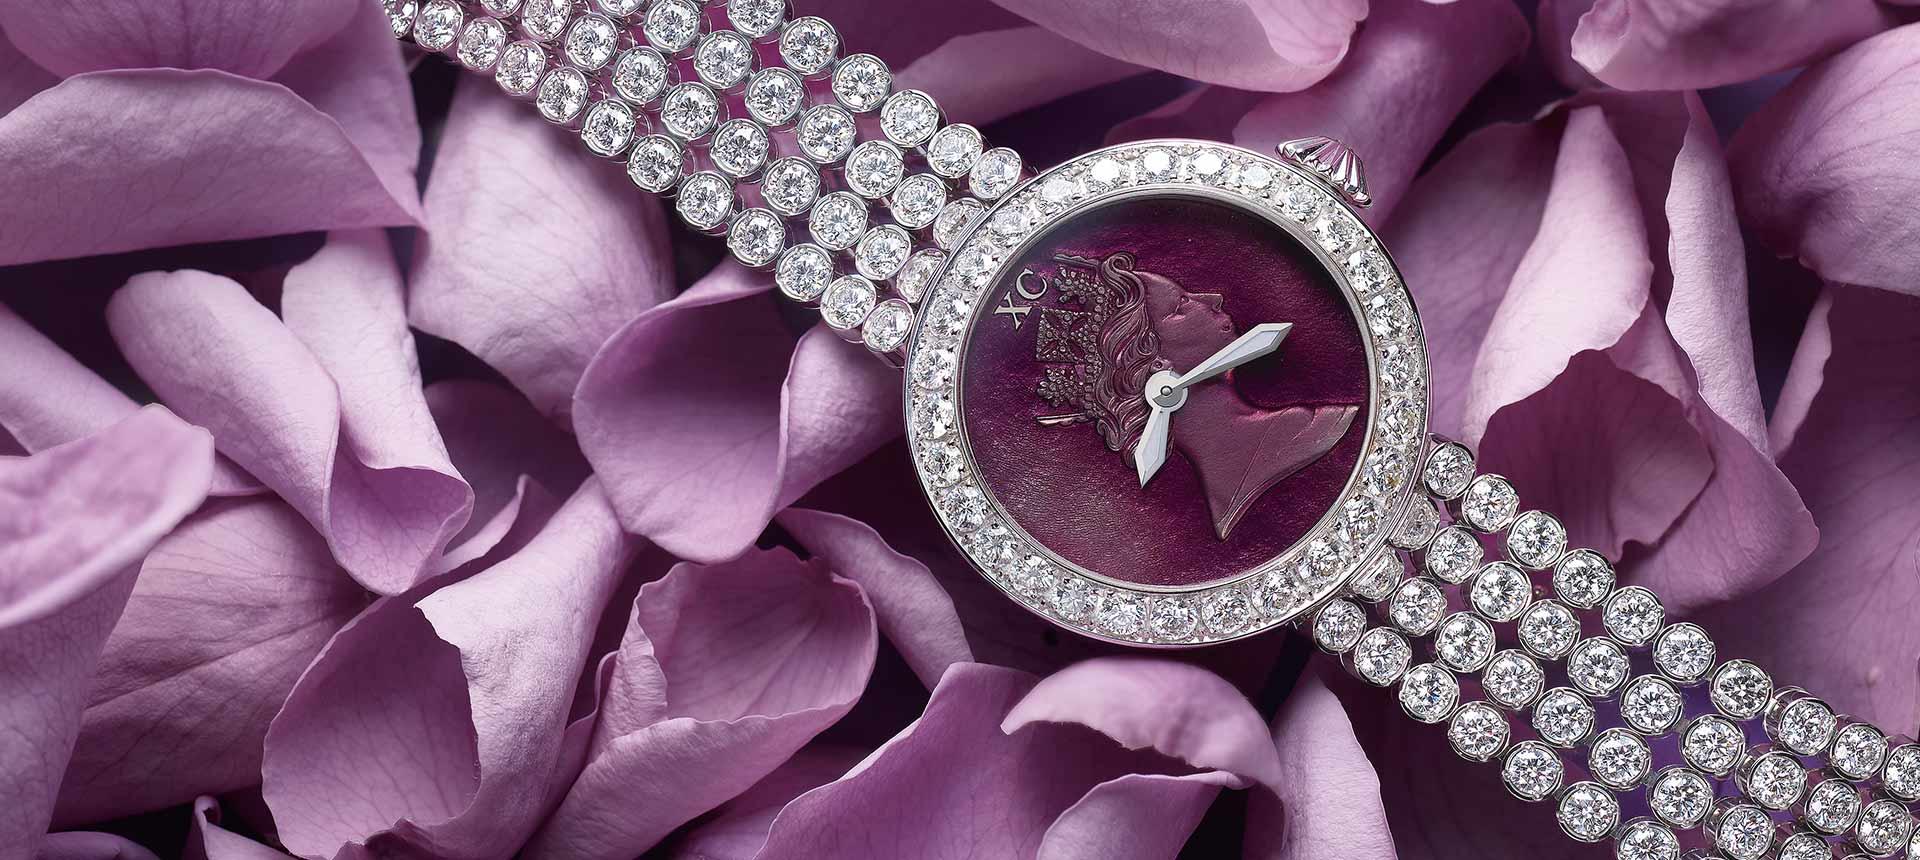 Princess Elizabeth limited edition ideal cut diamond watch for her